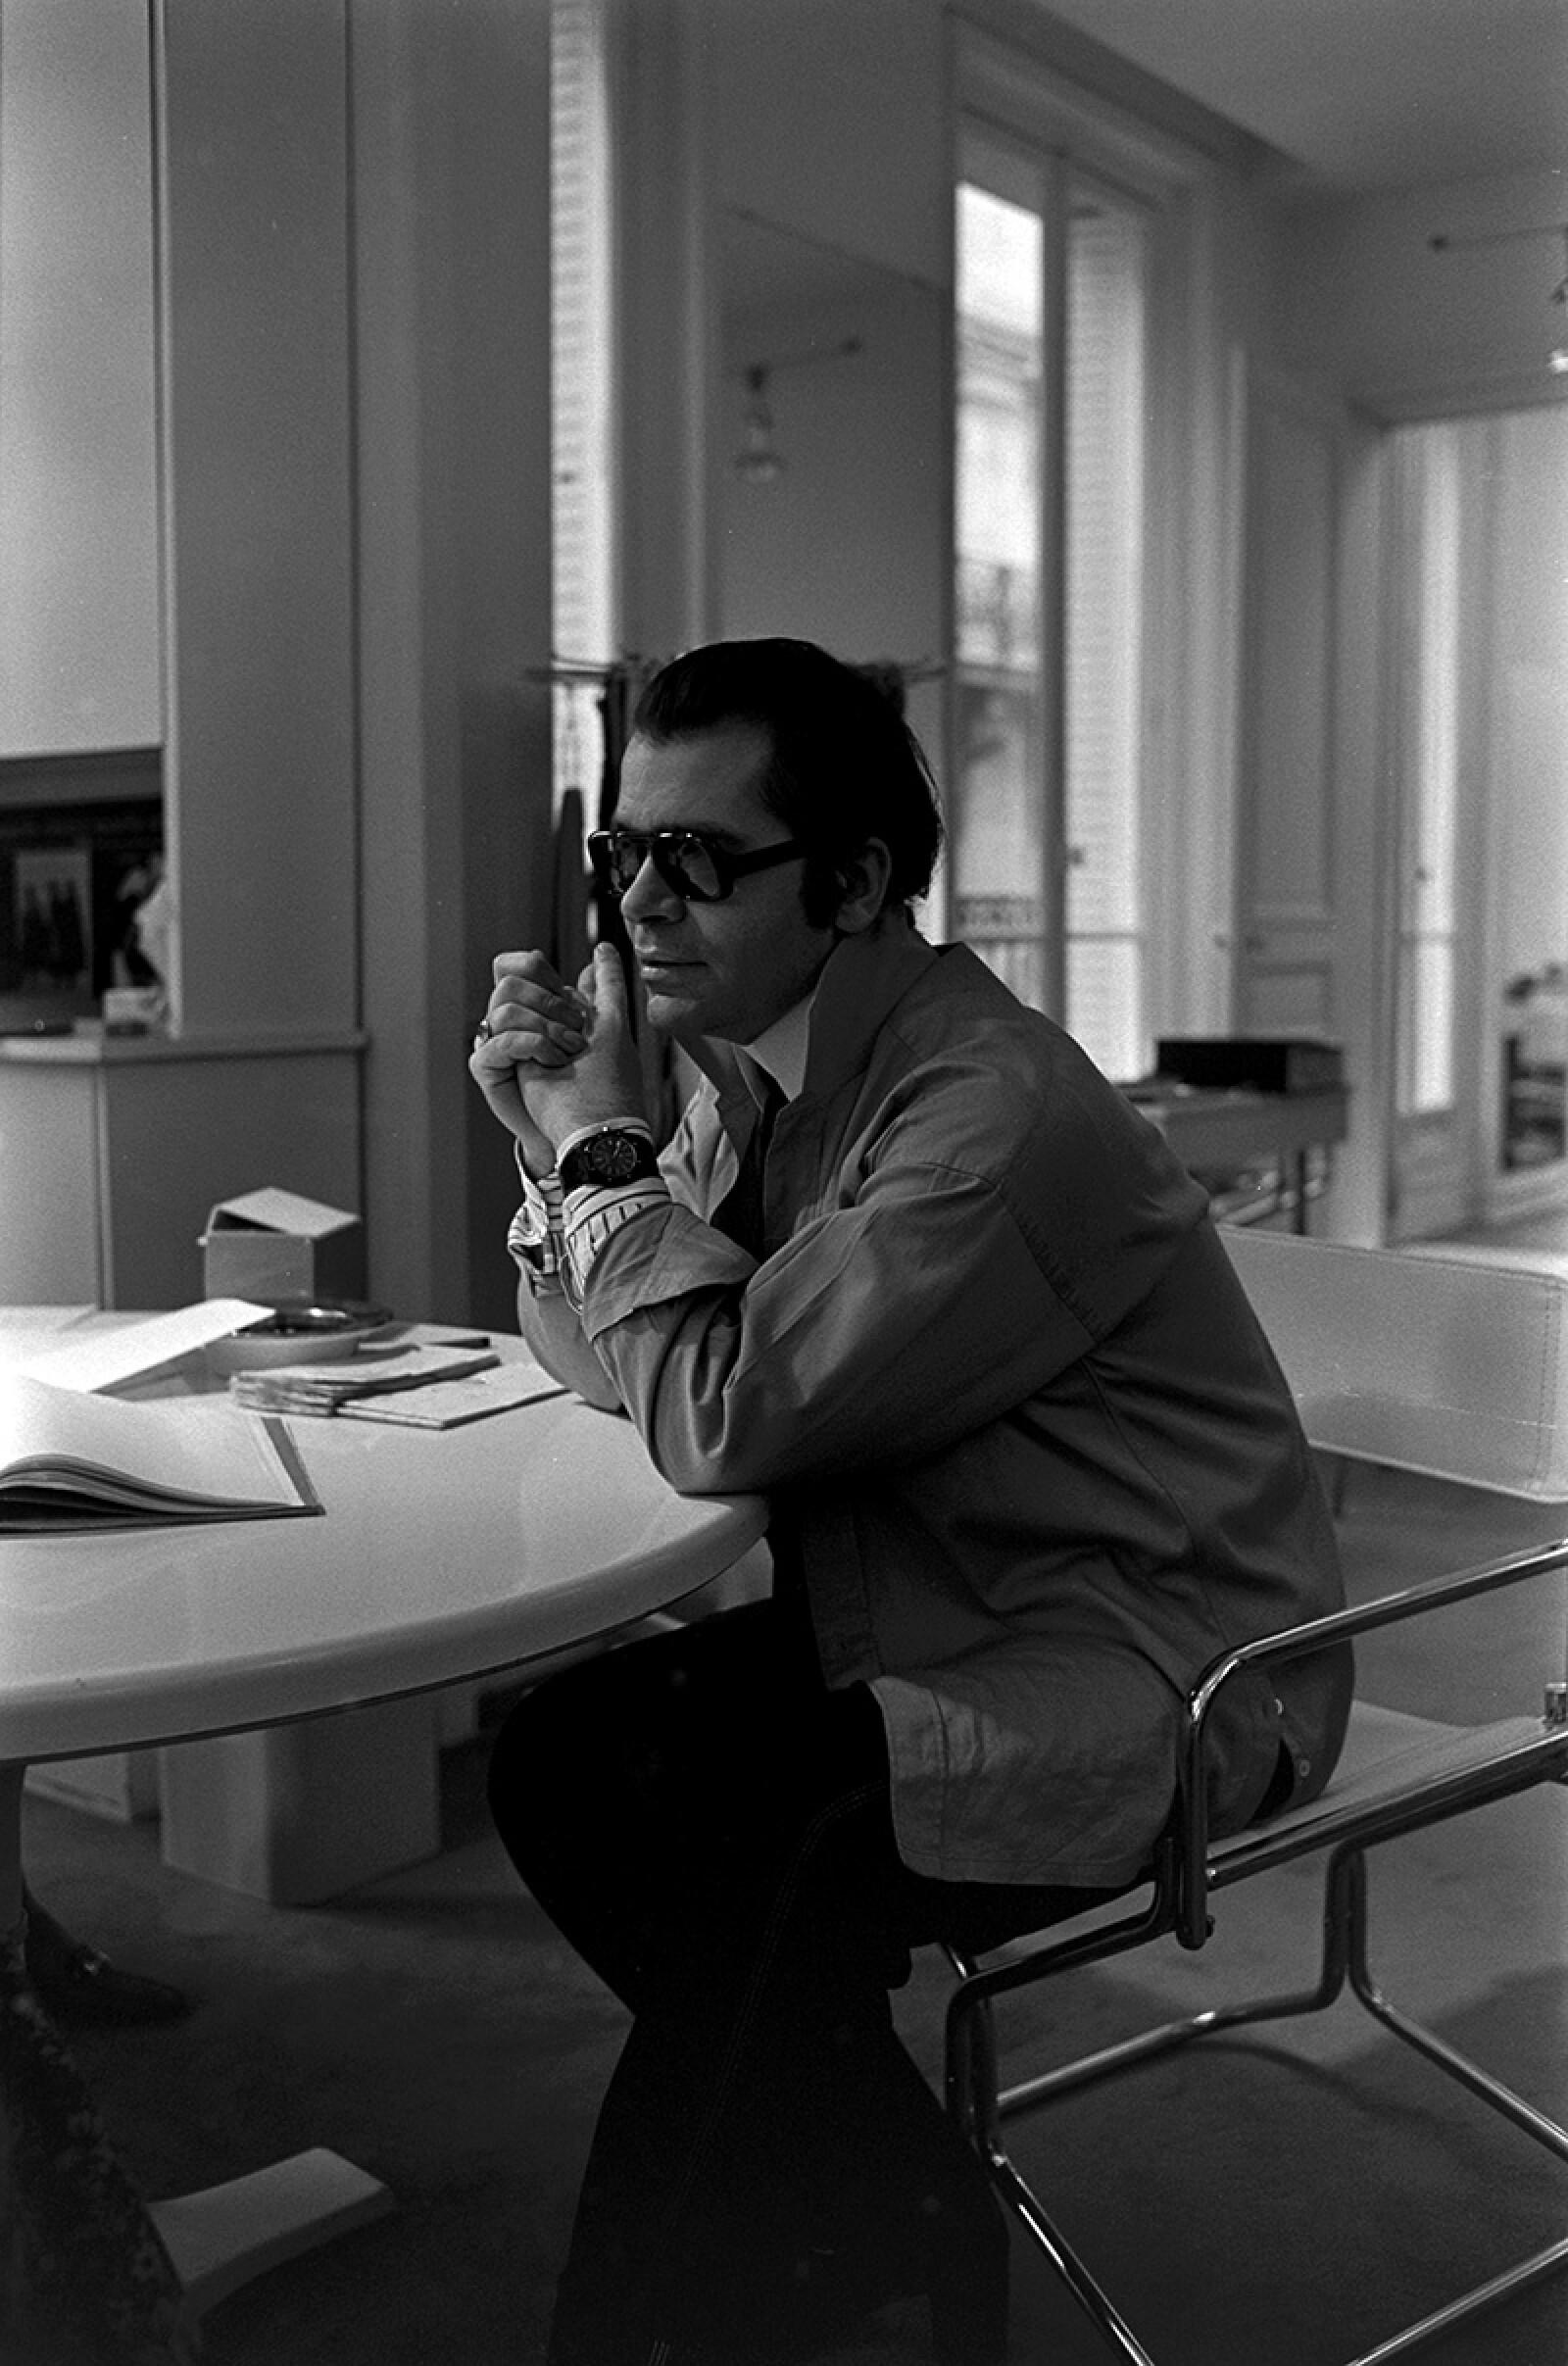 (Chloe) Karl Lagerfeld, Paris - Paris, Paris - 12 Feb 1977